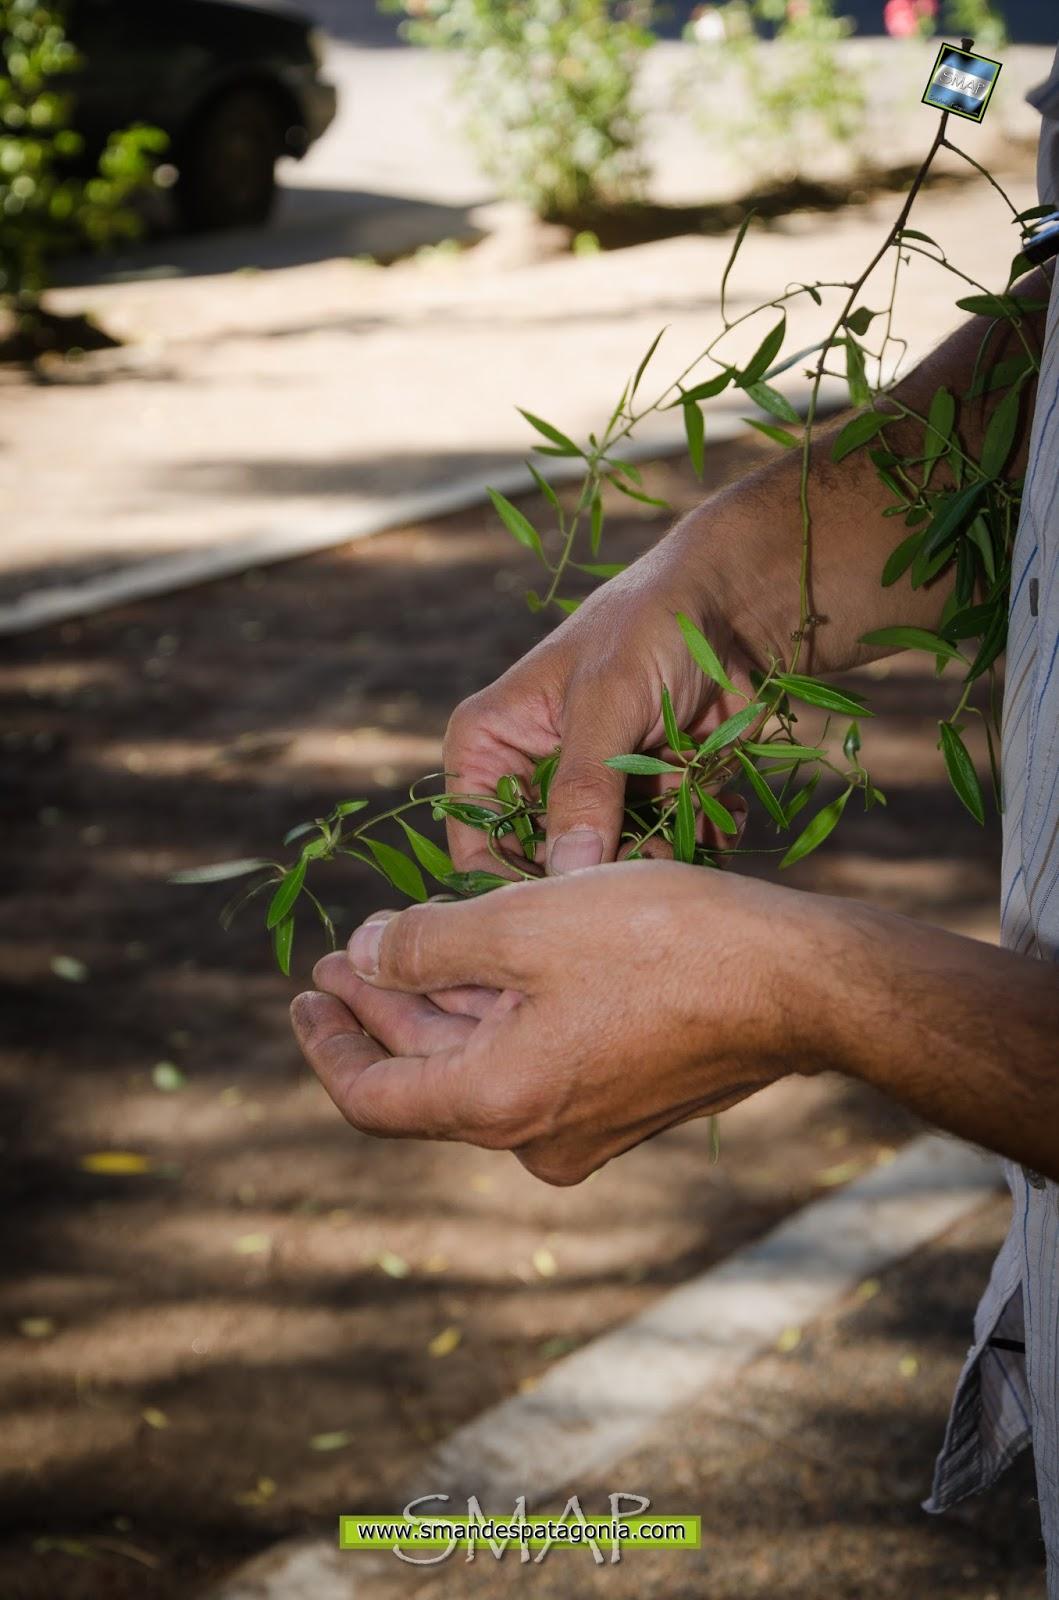 Sobre las plantas: El Maitén